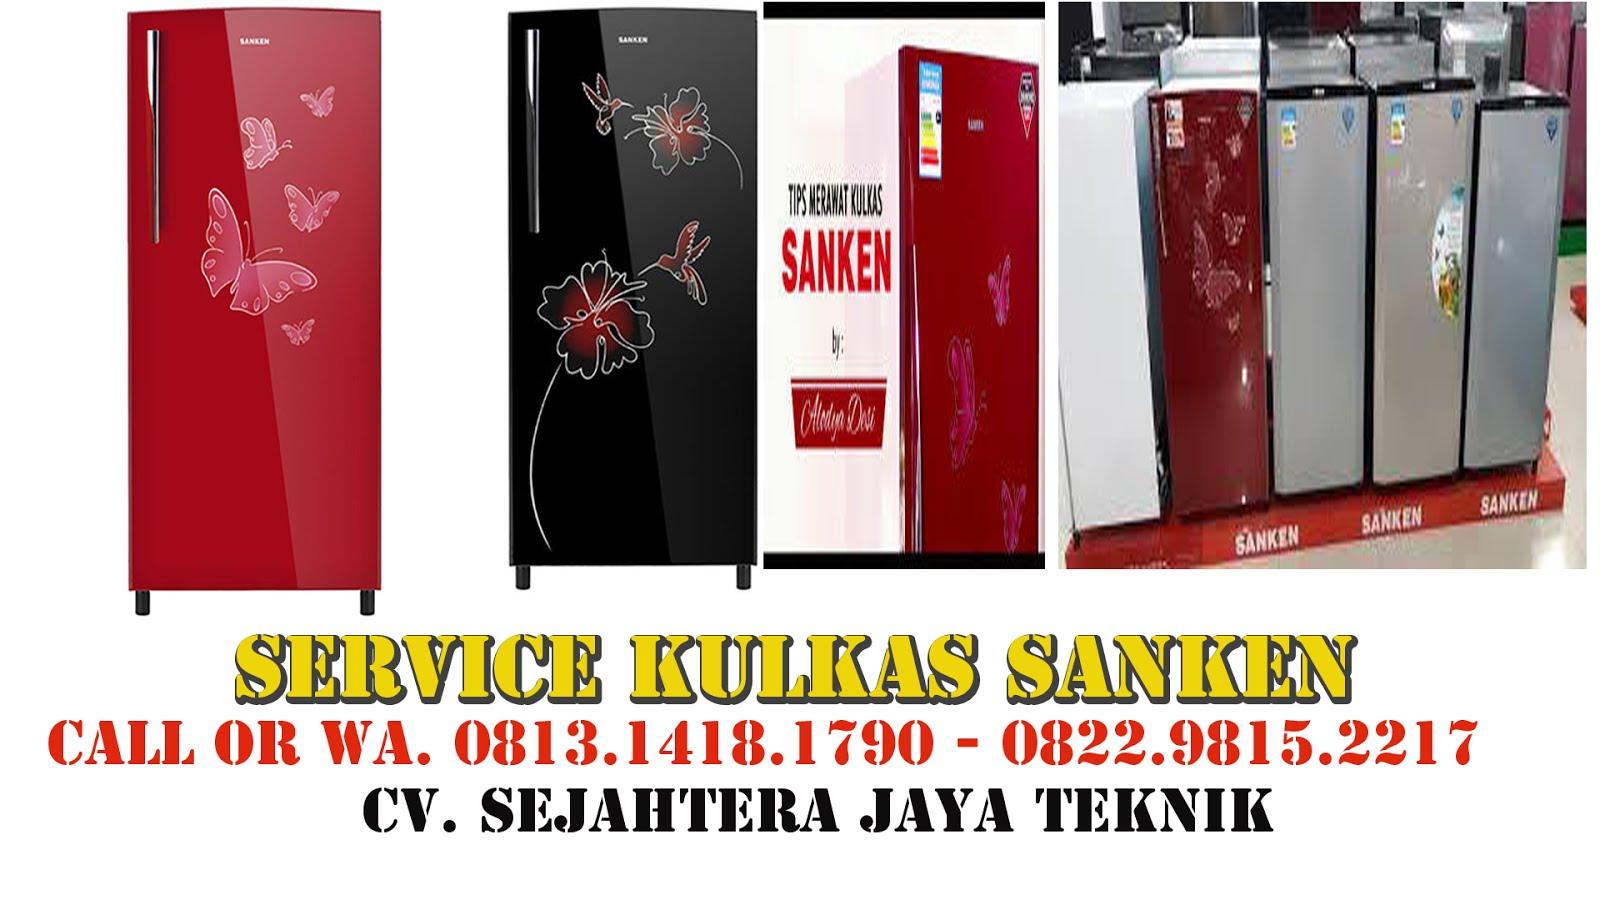 Service Kulkas Sanken Jakarta Pusat